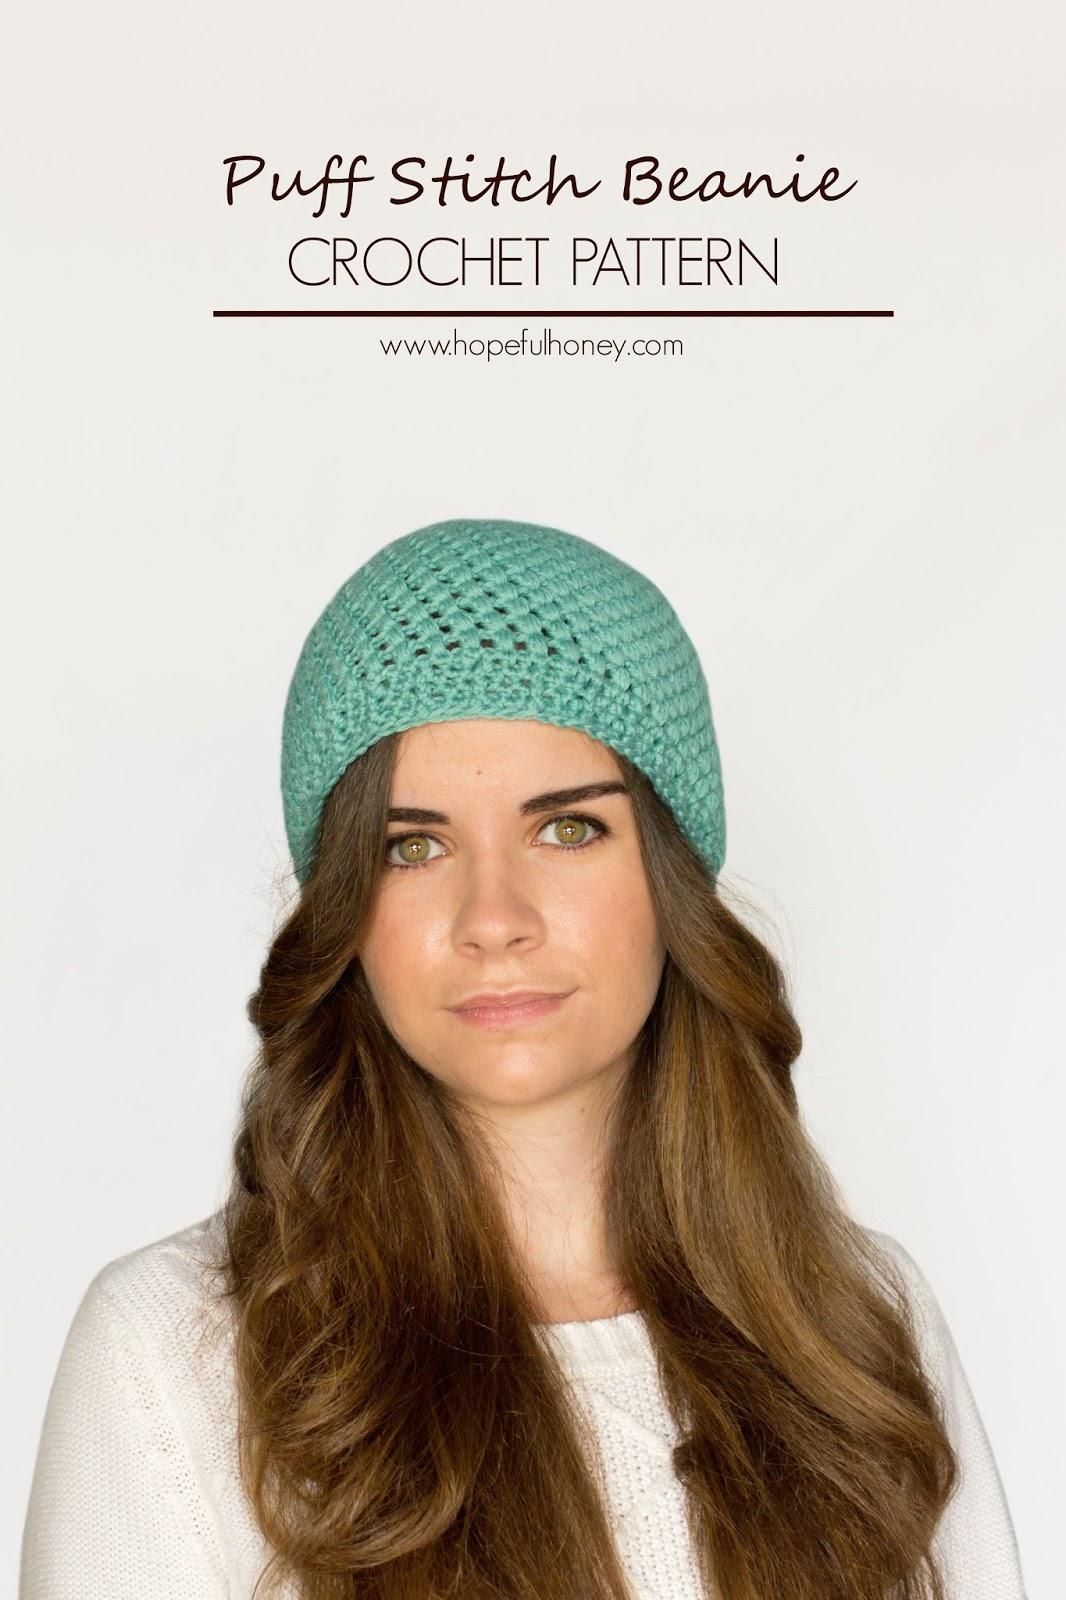 Hopeful Honey | Craft, Crochet, Create